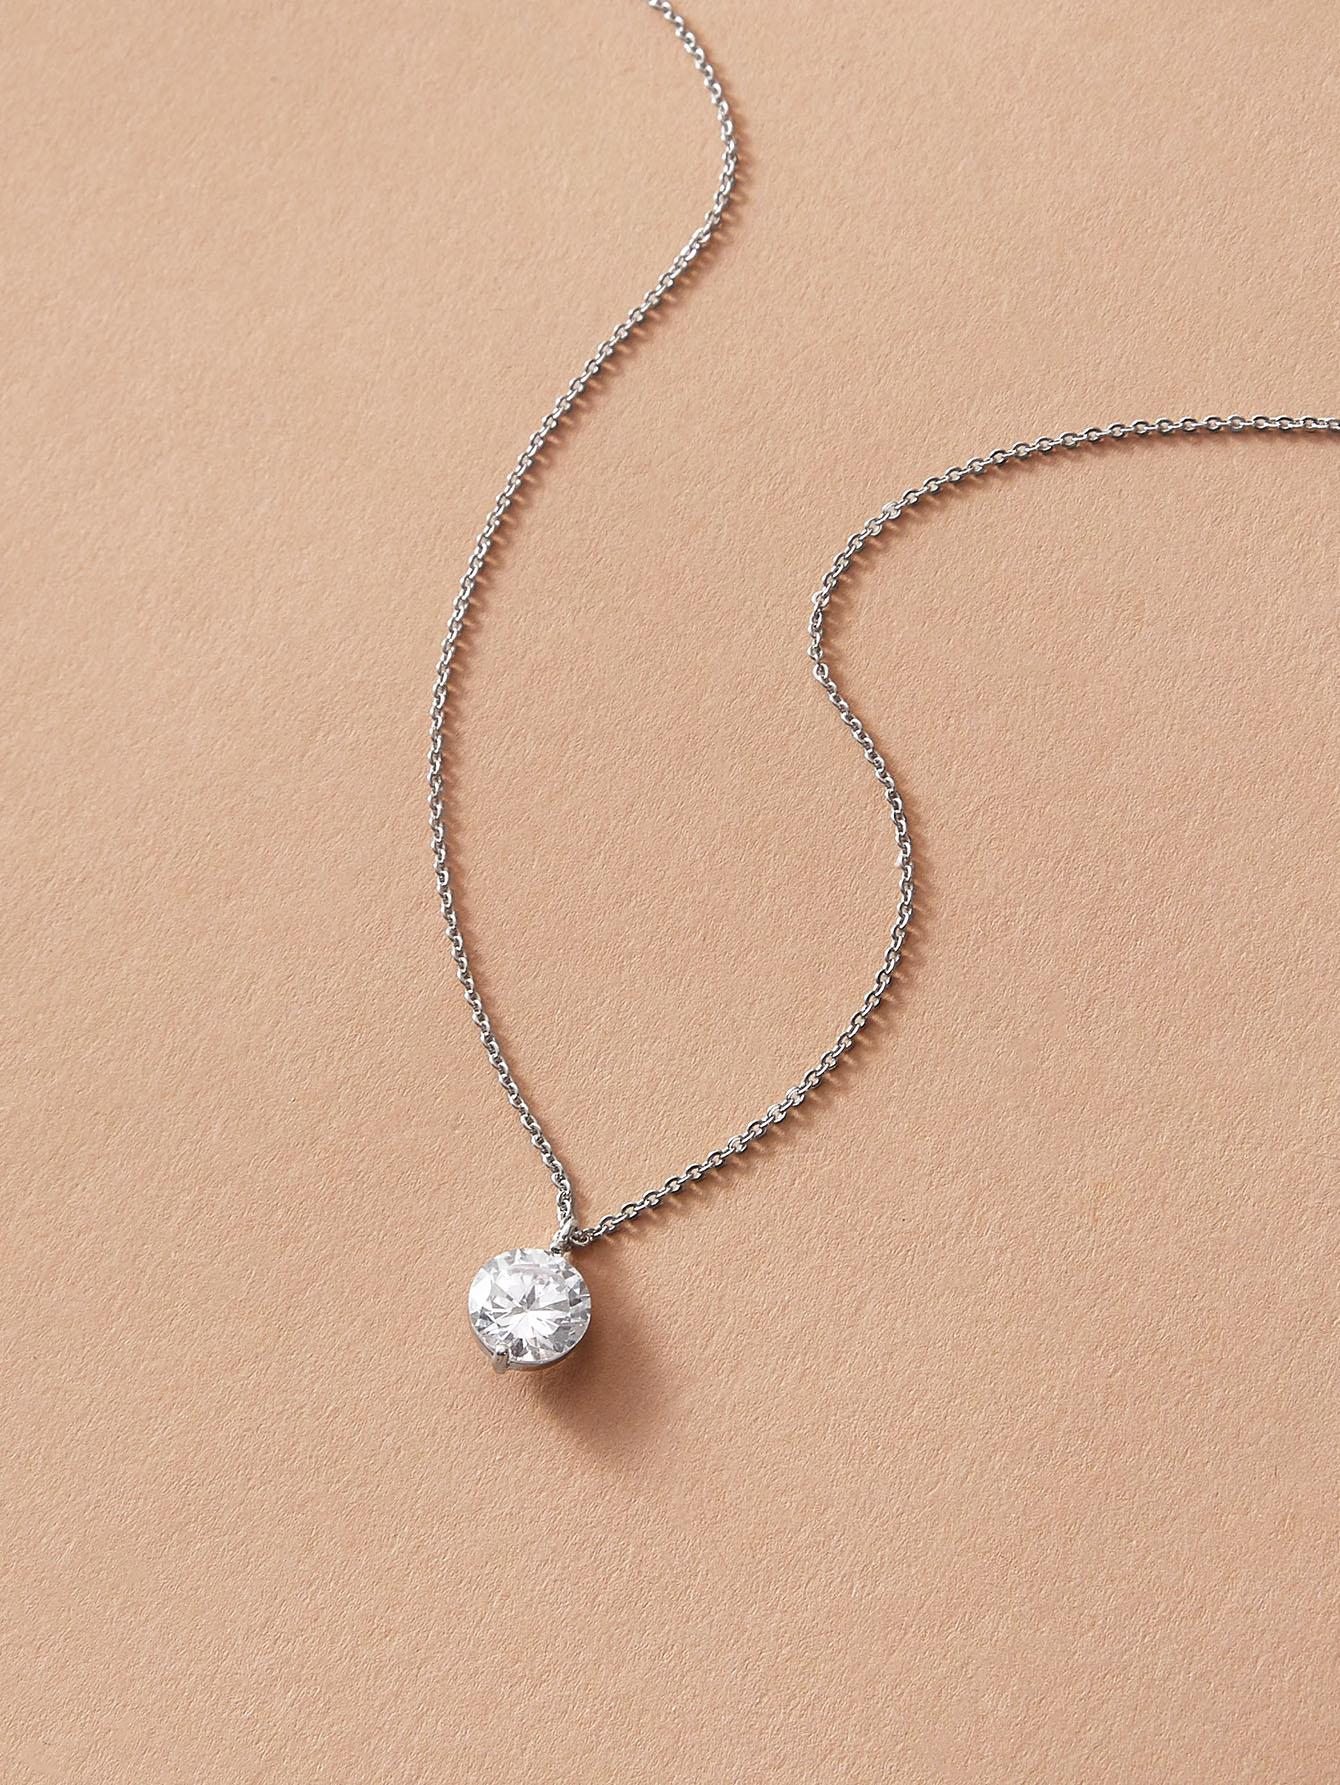 1pc Rhinestone Decor Pendant Necklace thumbnail